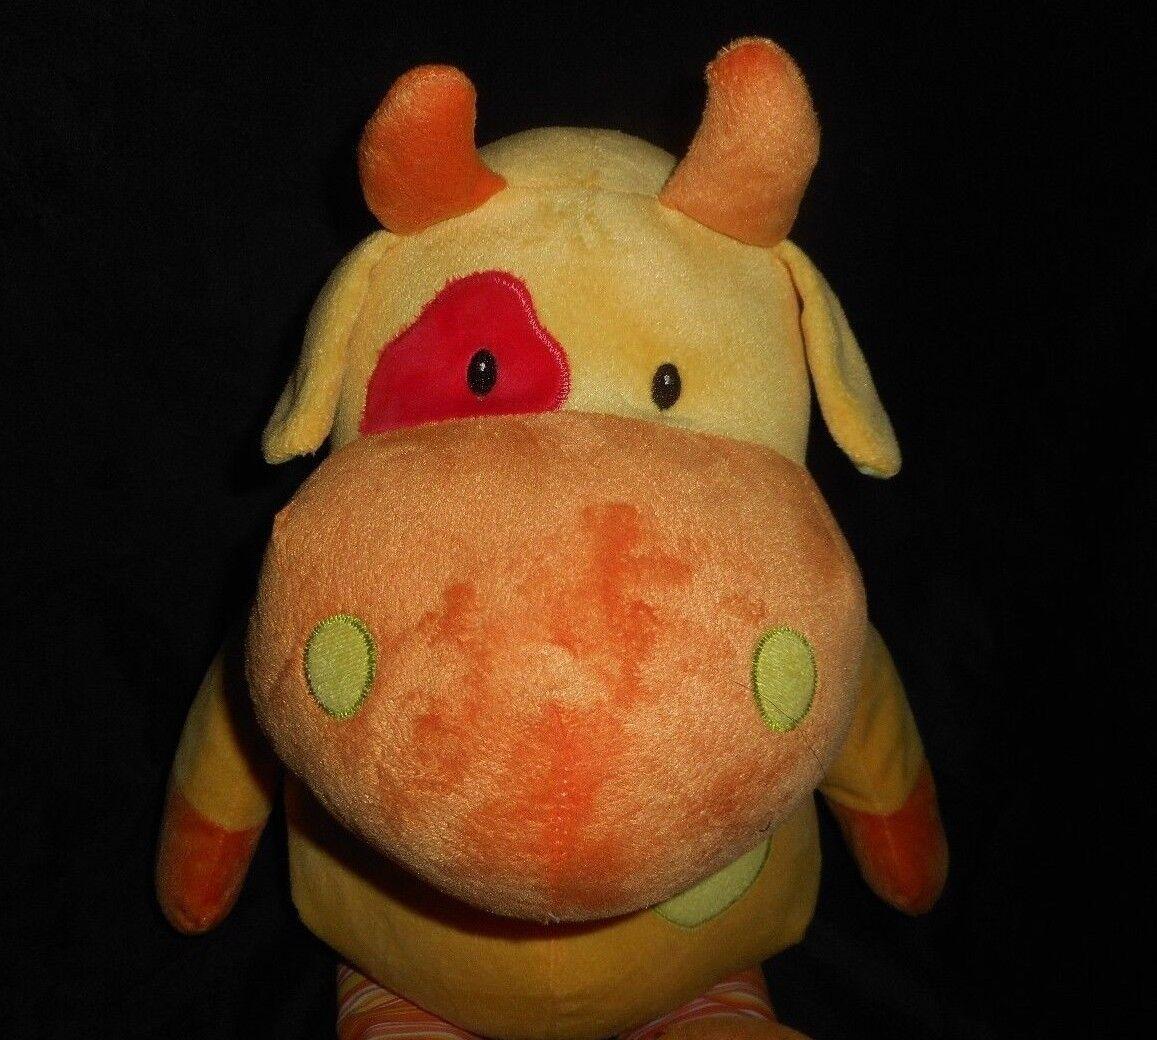 24   Groß Beverly Beverly Beverly Hills Teddybär Co Gelb Kuh Plüschtier Spielzeug Lovey 7bea95